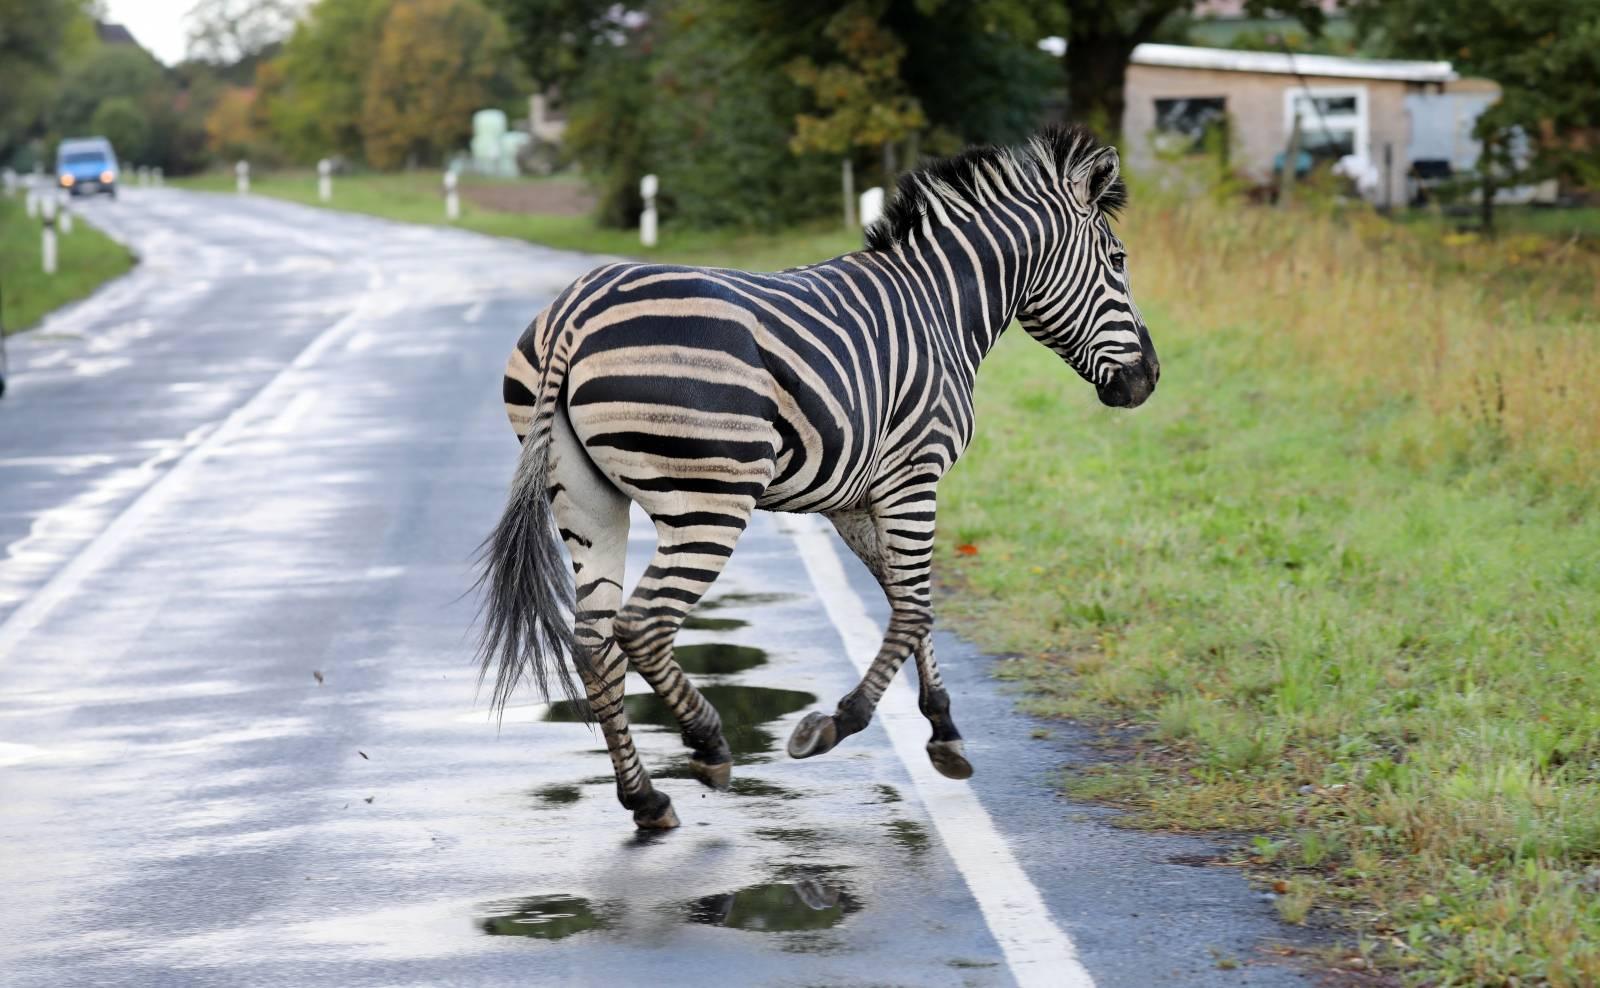 Circus zebras erupted